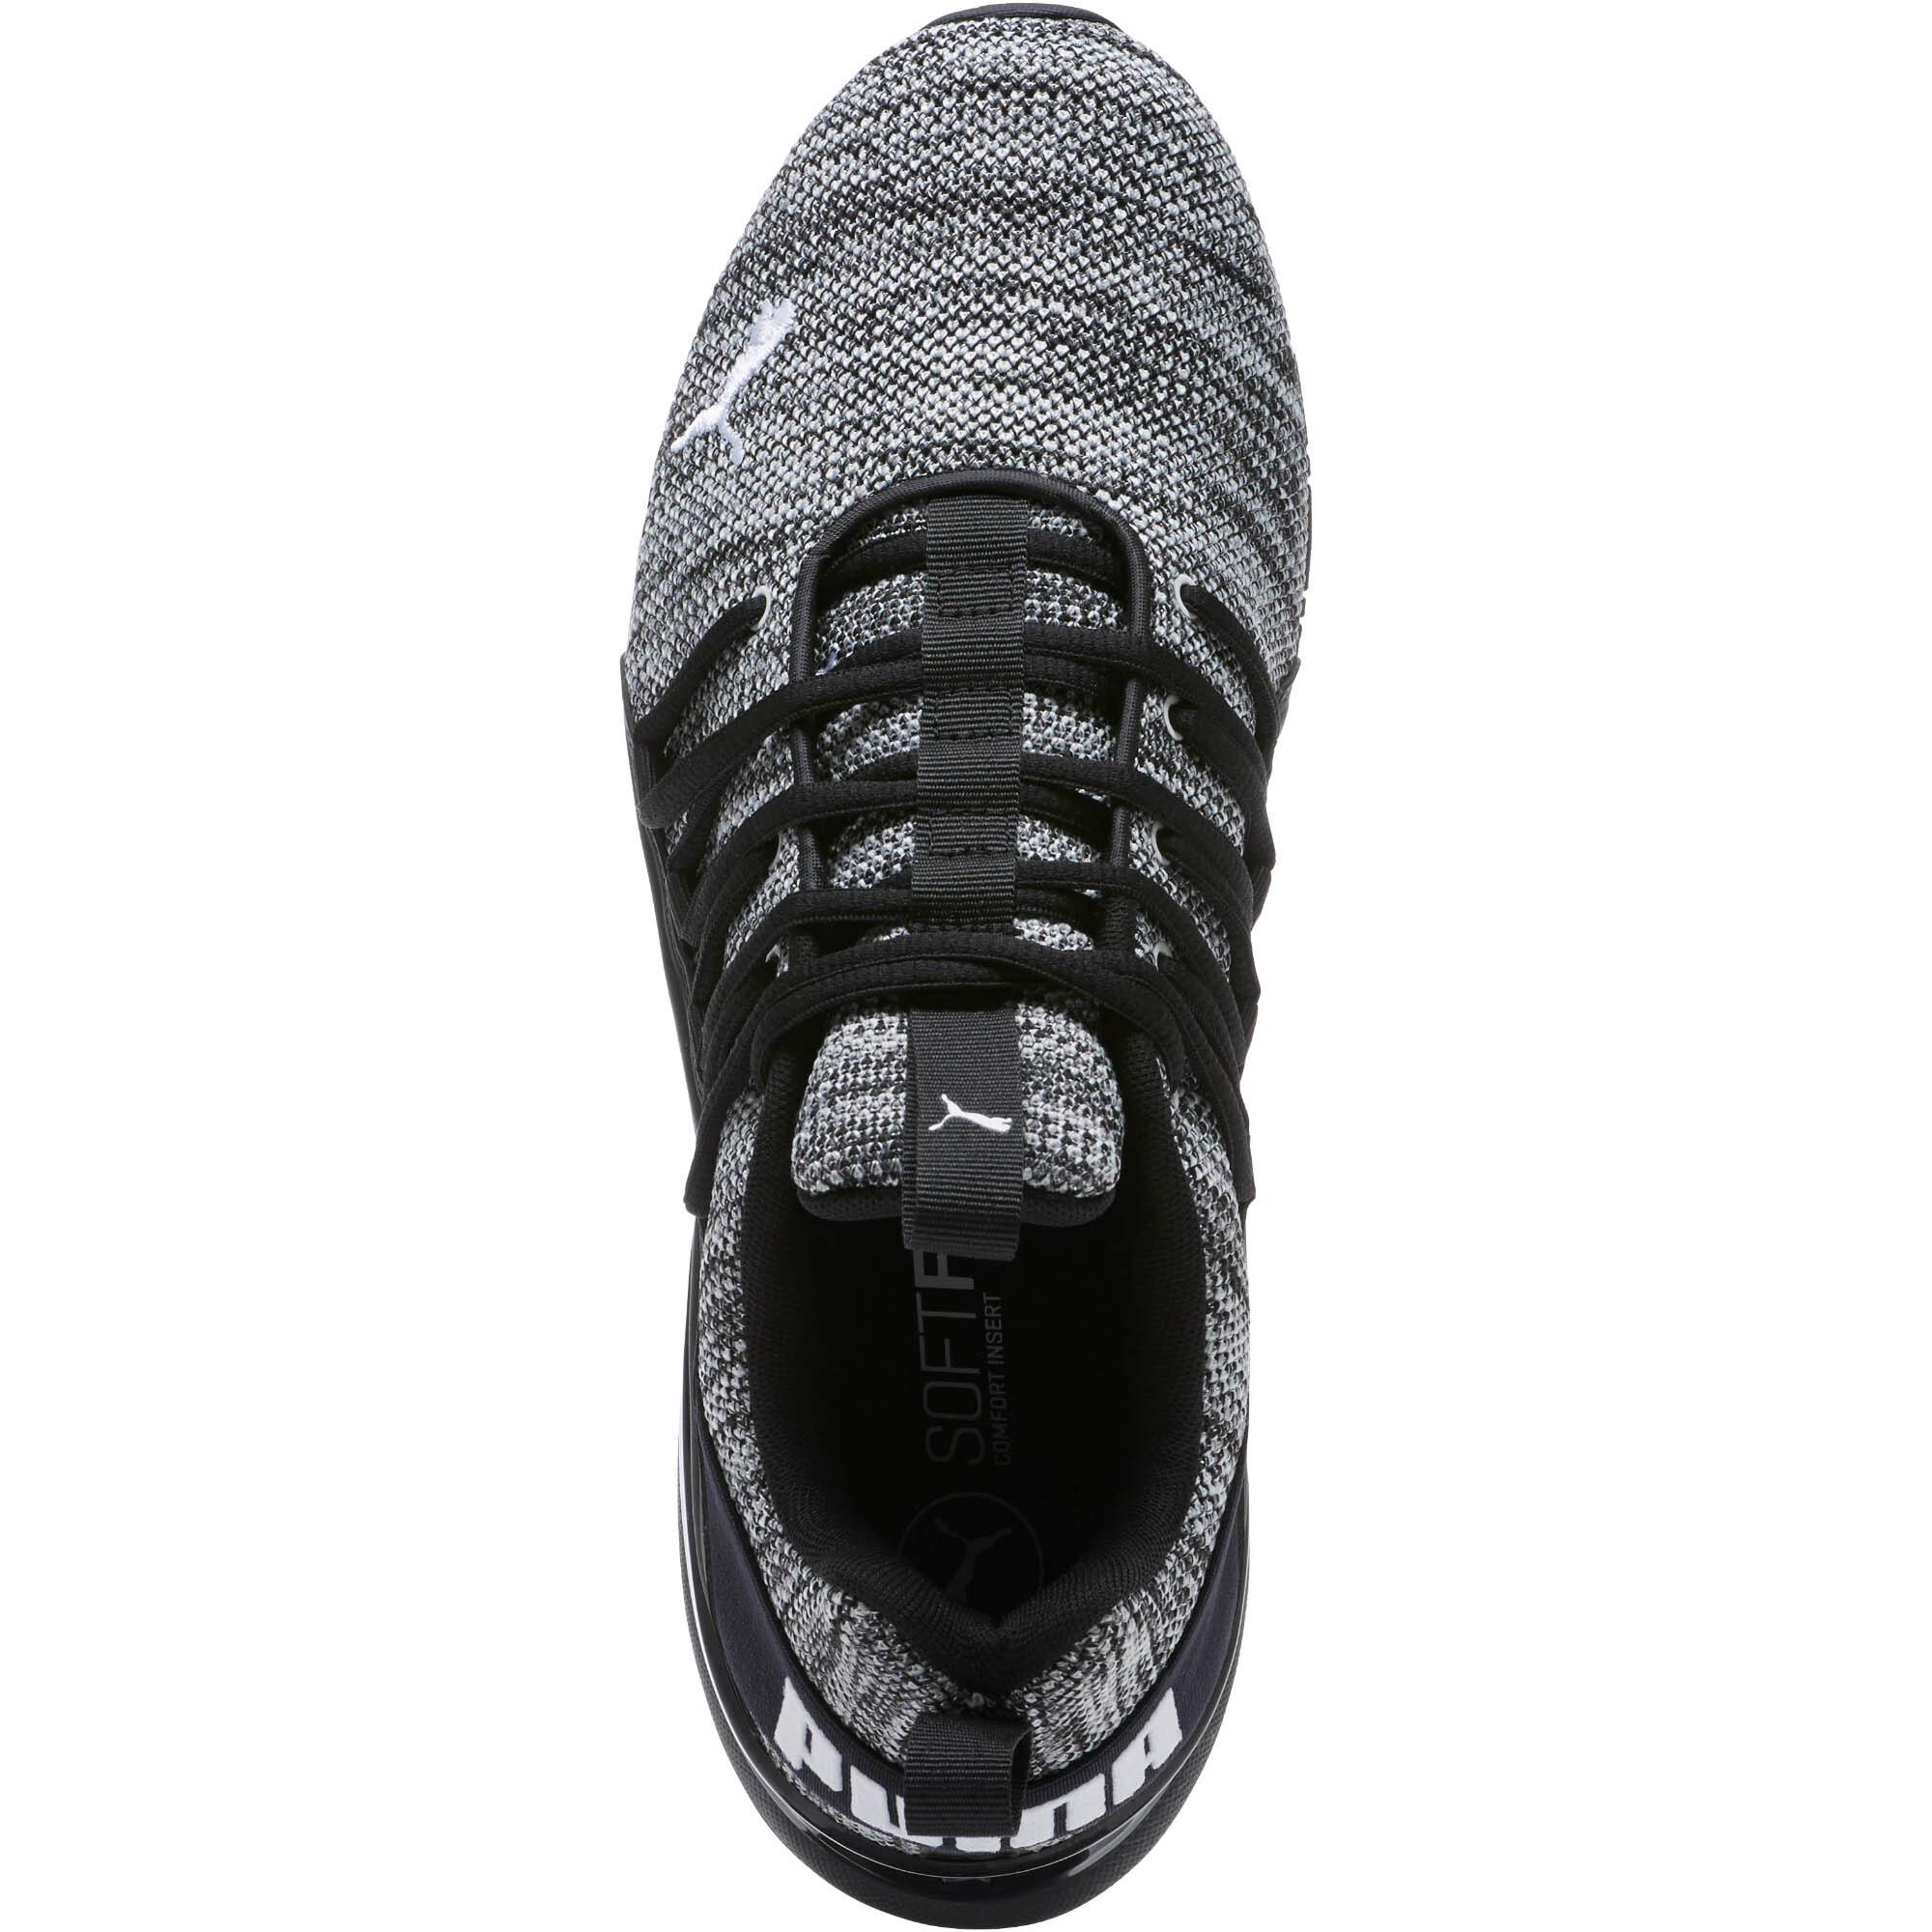 PUMA-Axelion-Men-039-s-Training-Shoes-Men-Shoe-Running thumbnail 19